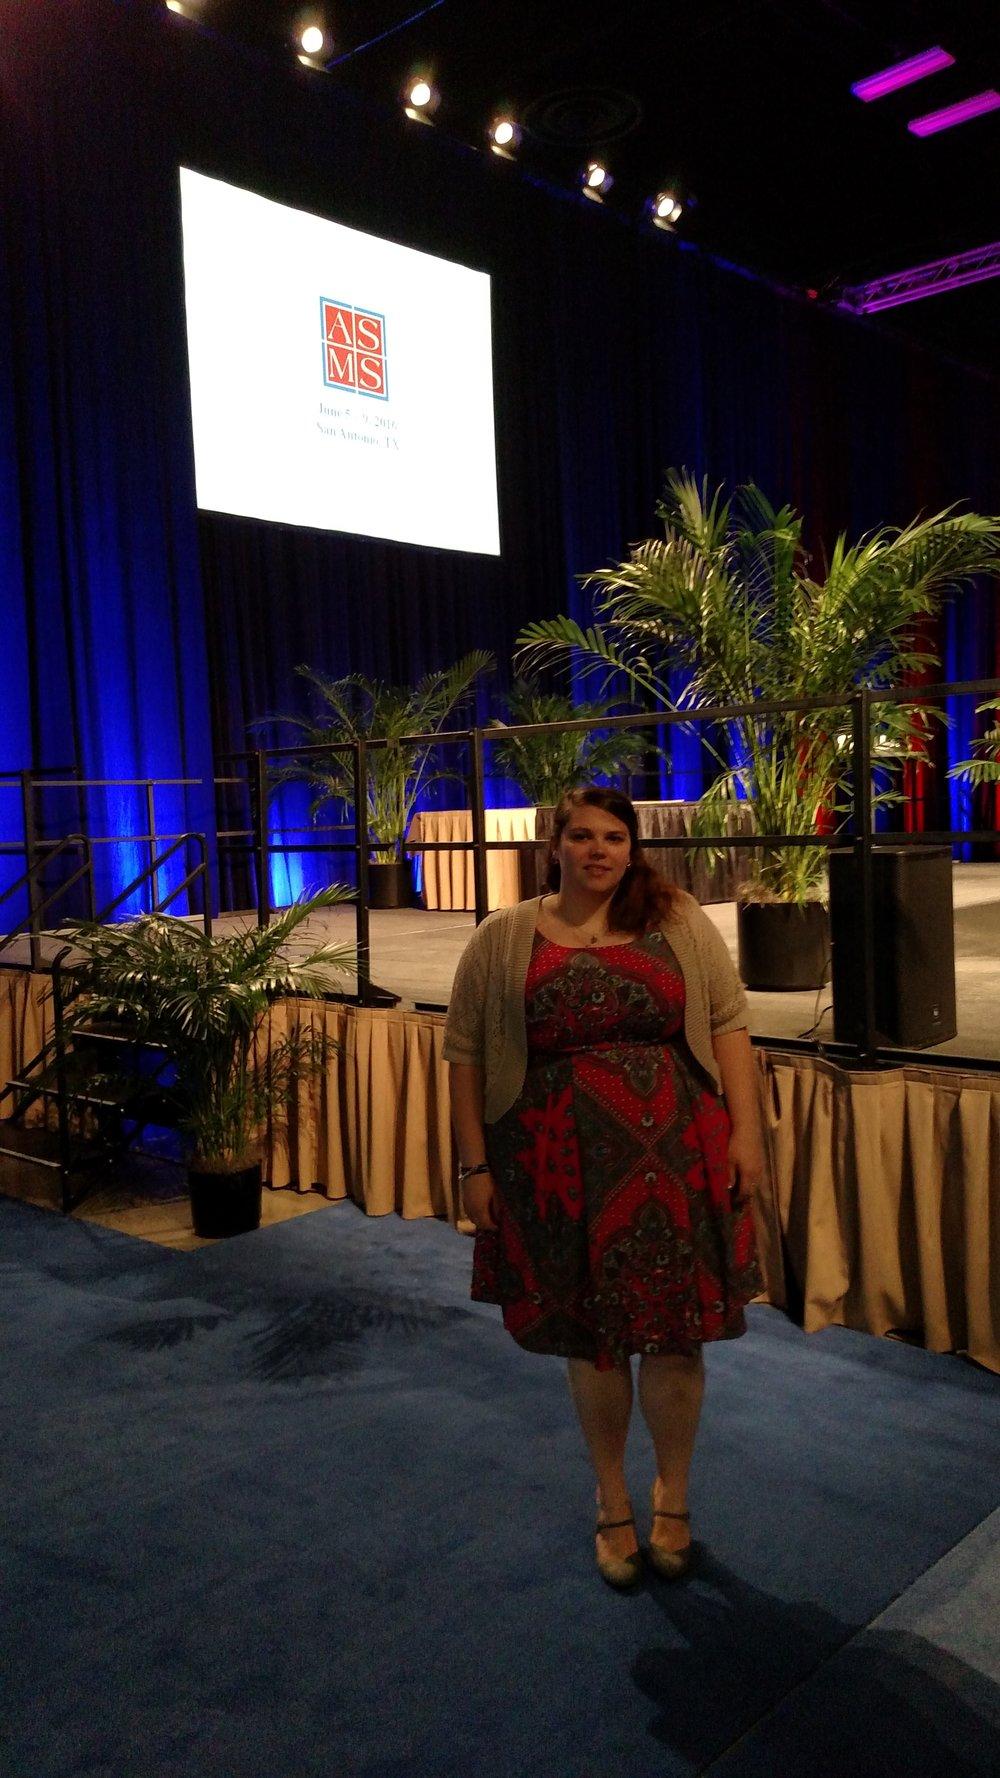 Justine presenting at ASMS 2016.